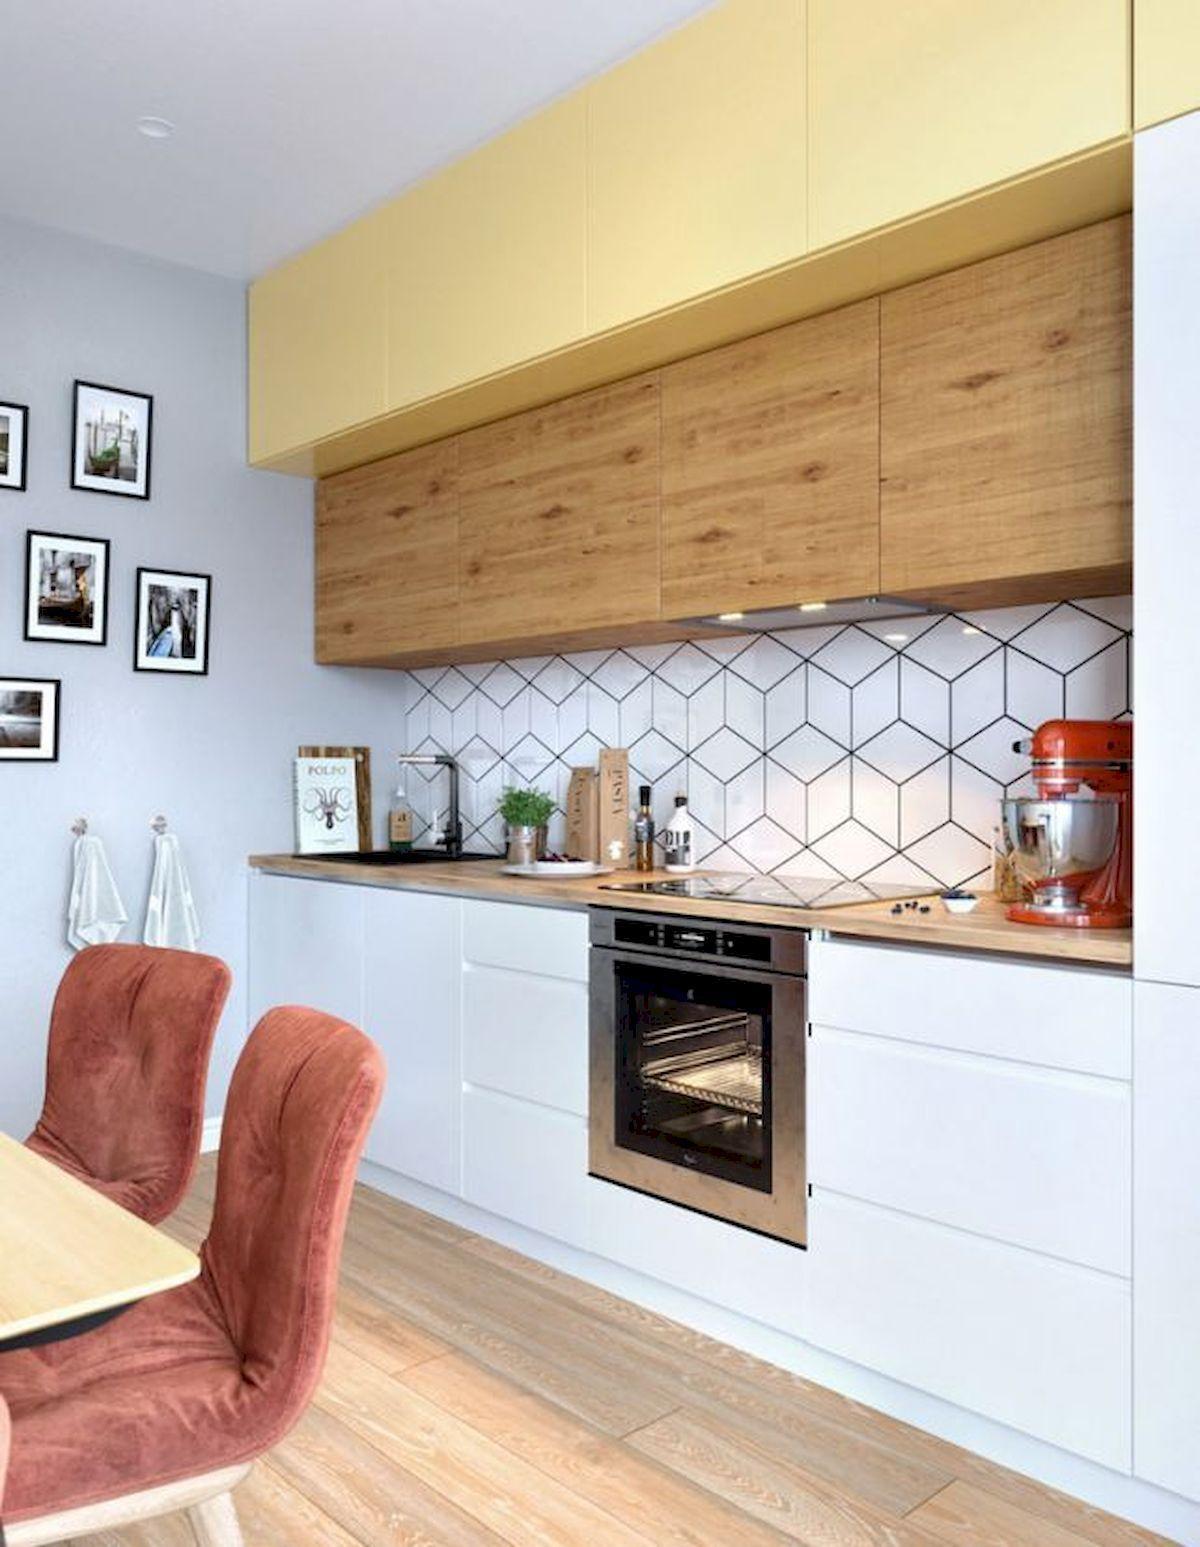 30 minimalist but luxurious kitchen design 30 jihanshanum kitchen redesign luxury on kitchen ideas minimalist id=40298